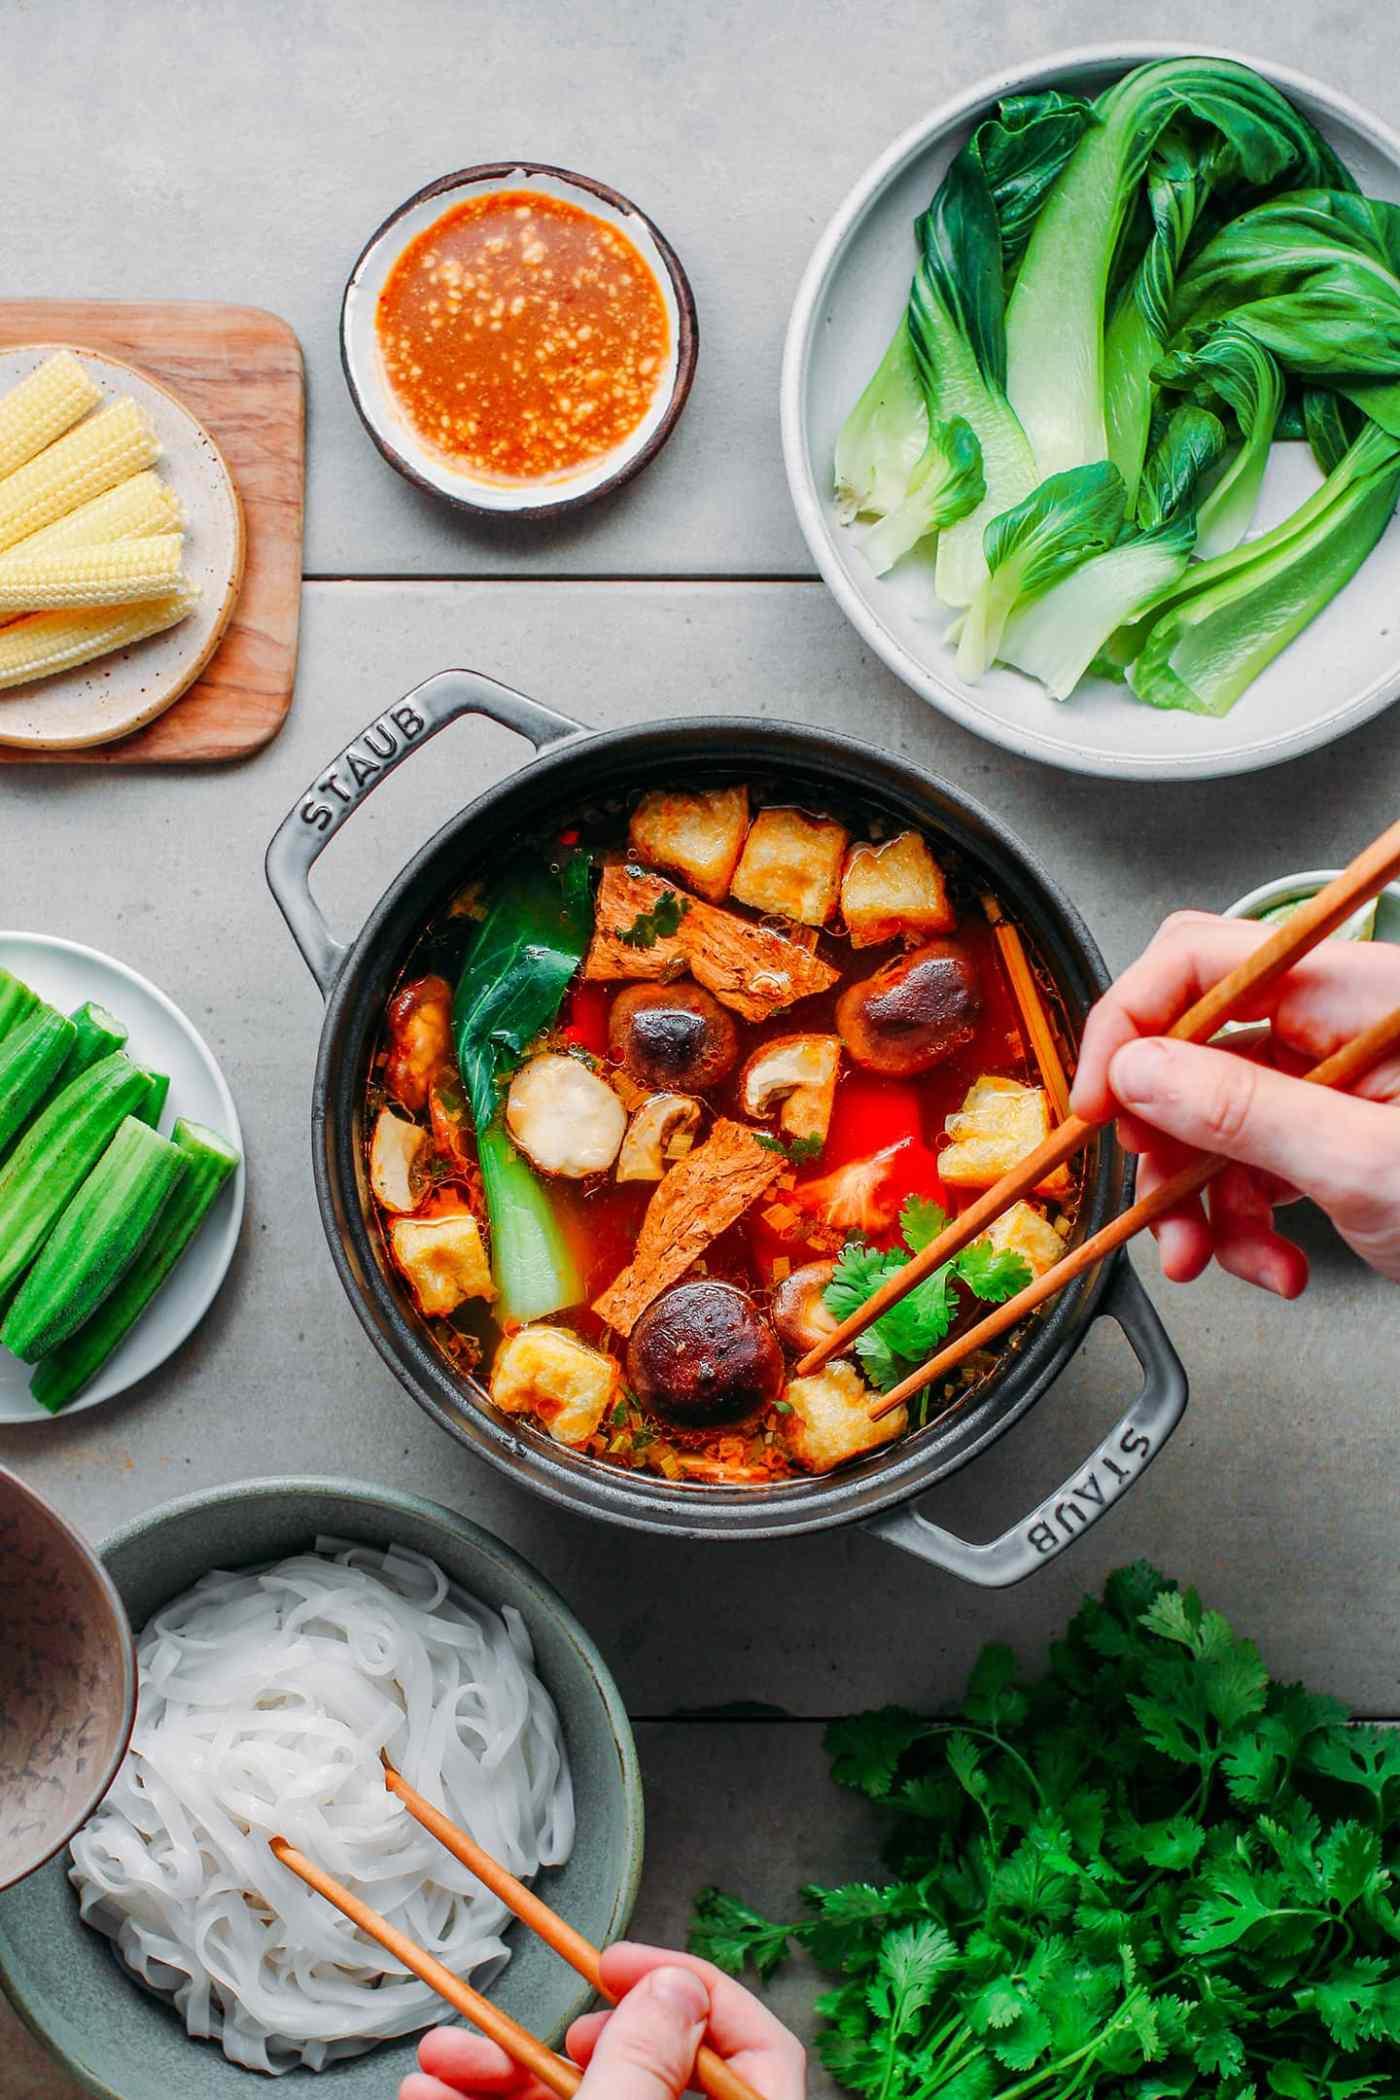 Spicy Vegan Hot Pot Full Of Plants